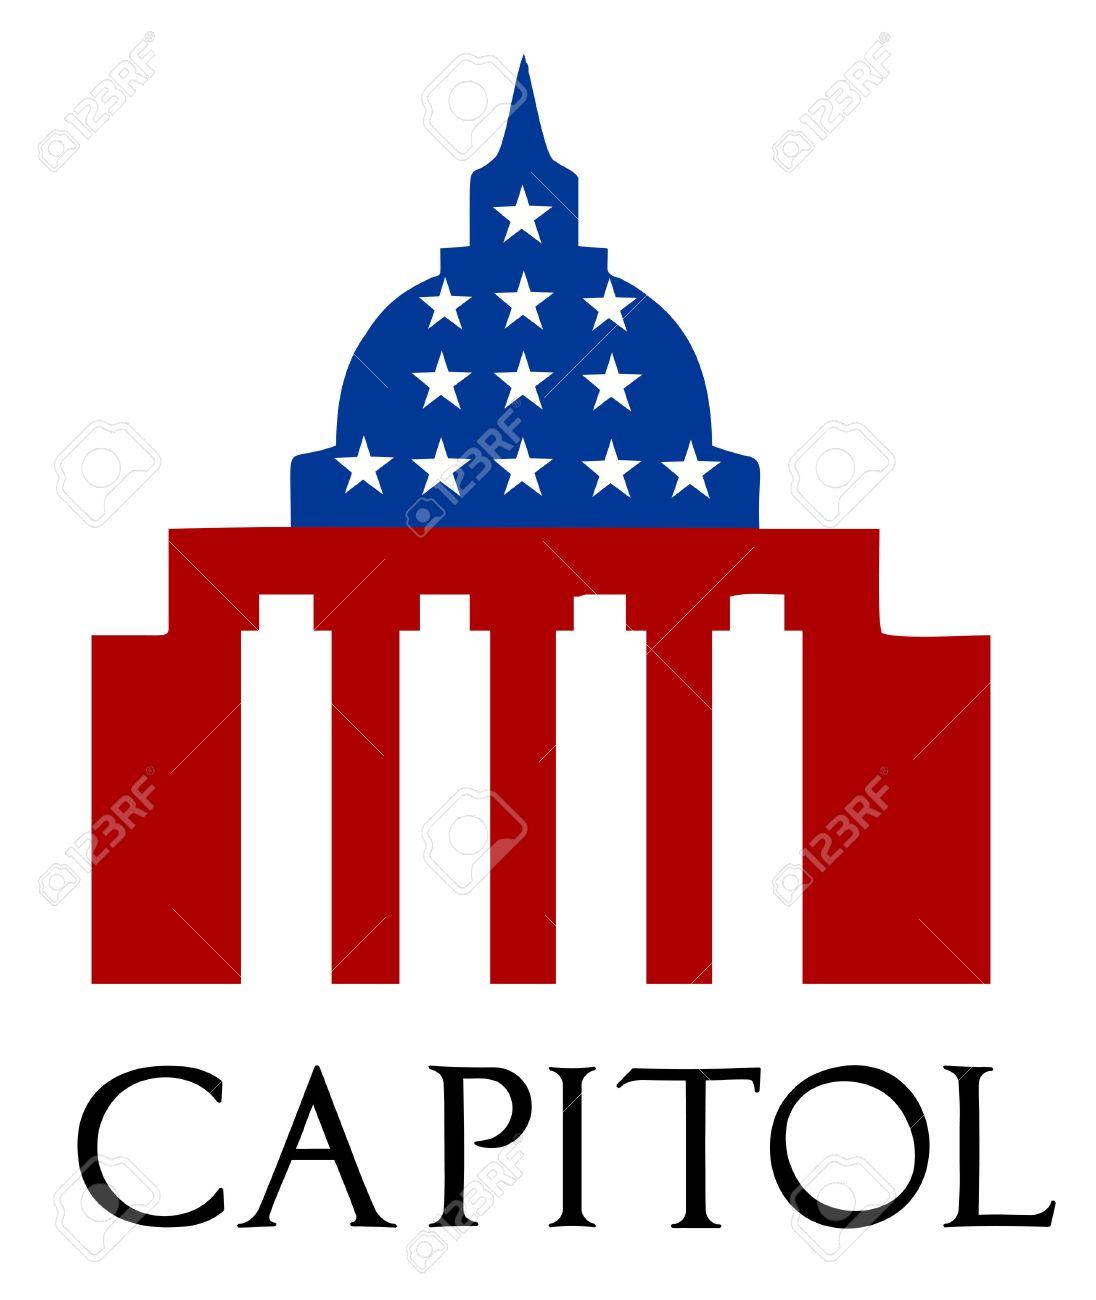 1096x1300 Illustration Of The U S Capitol, Washington D C Silhouette Royalty